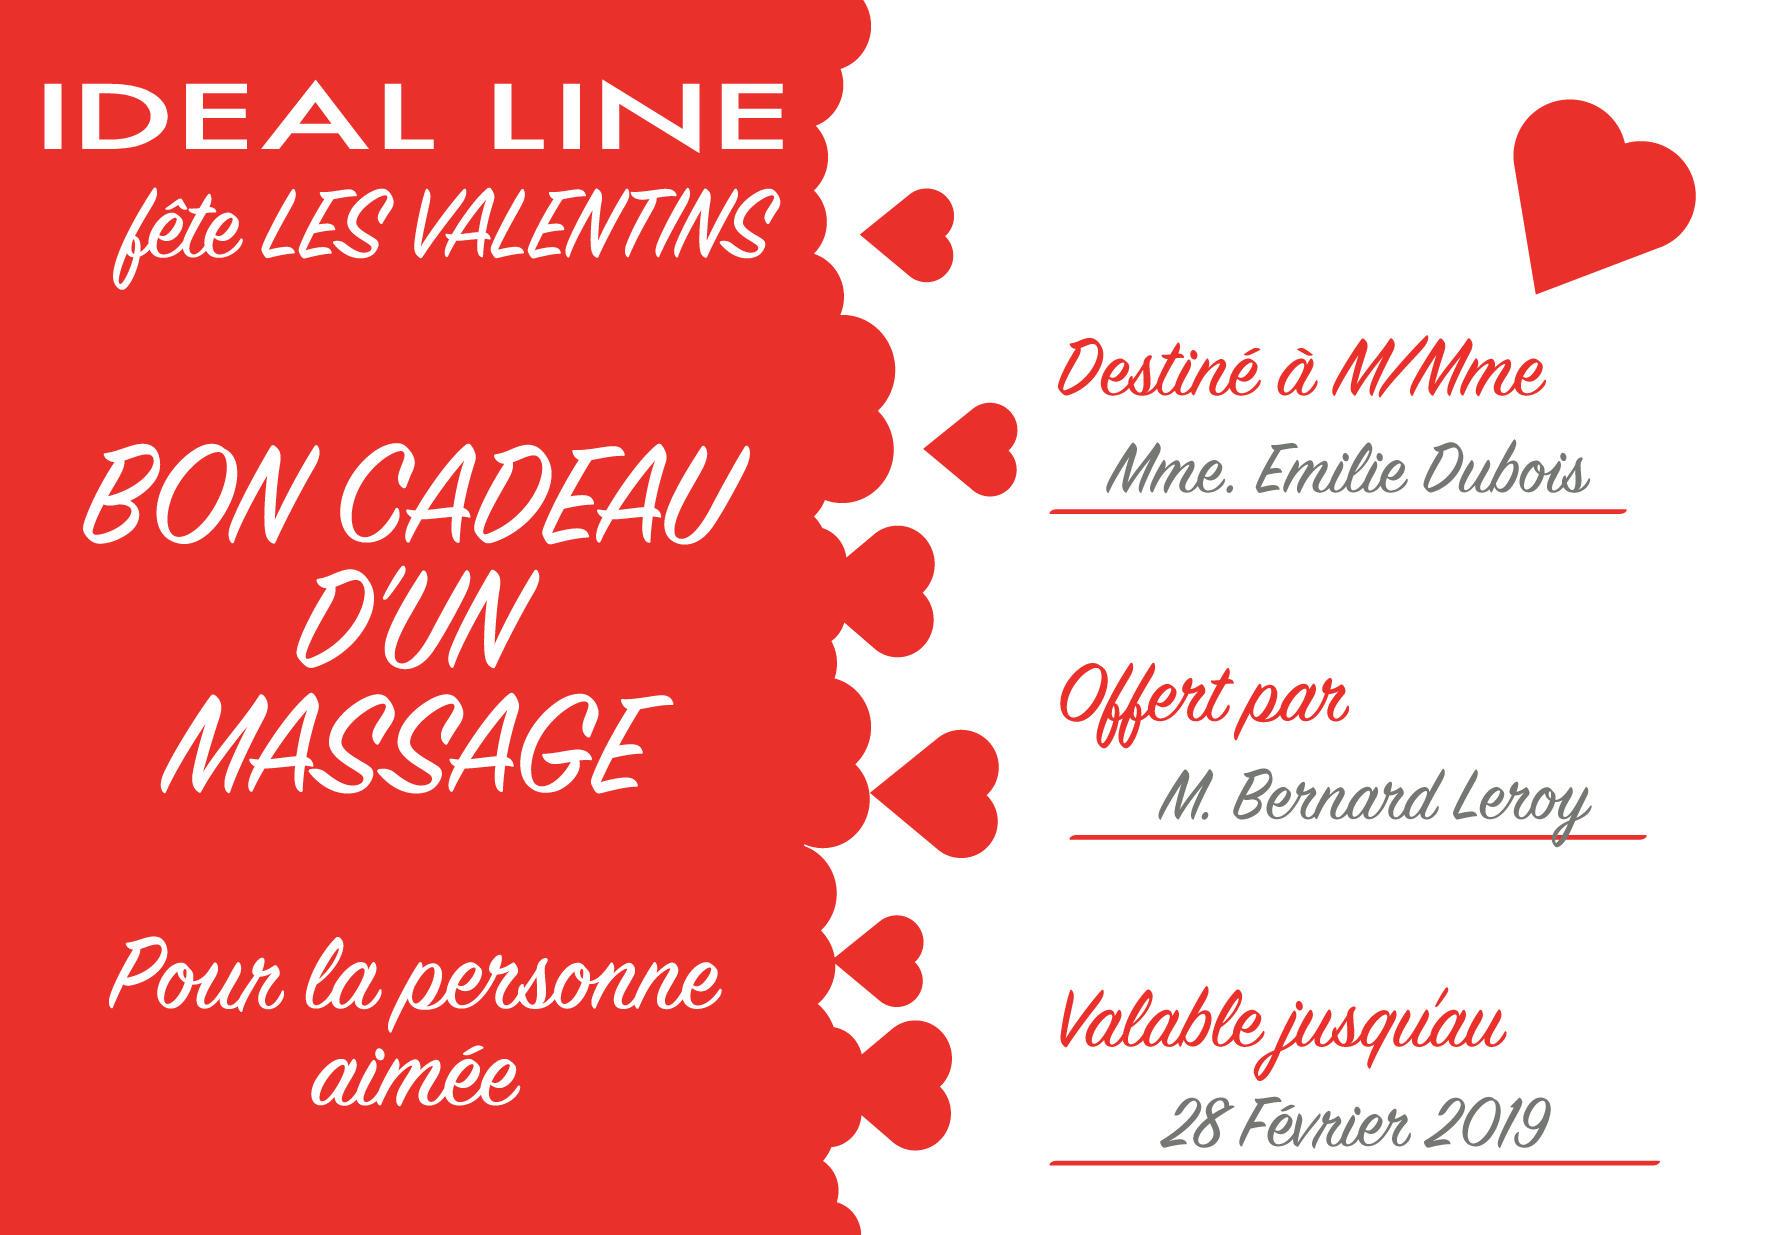 IDEAL LINE Genève